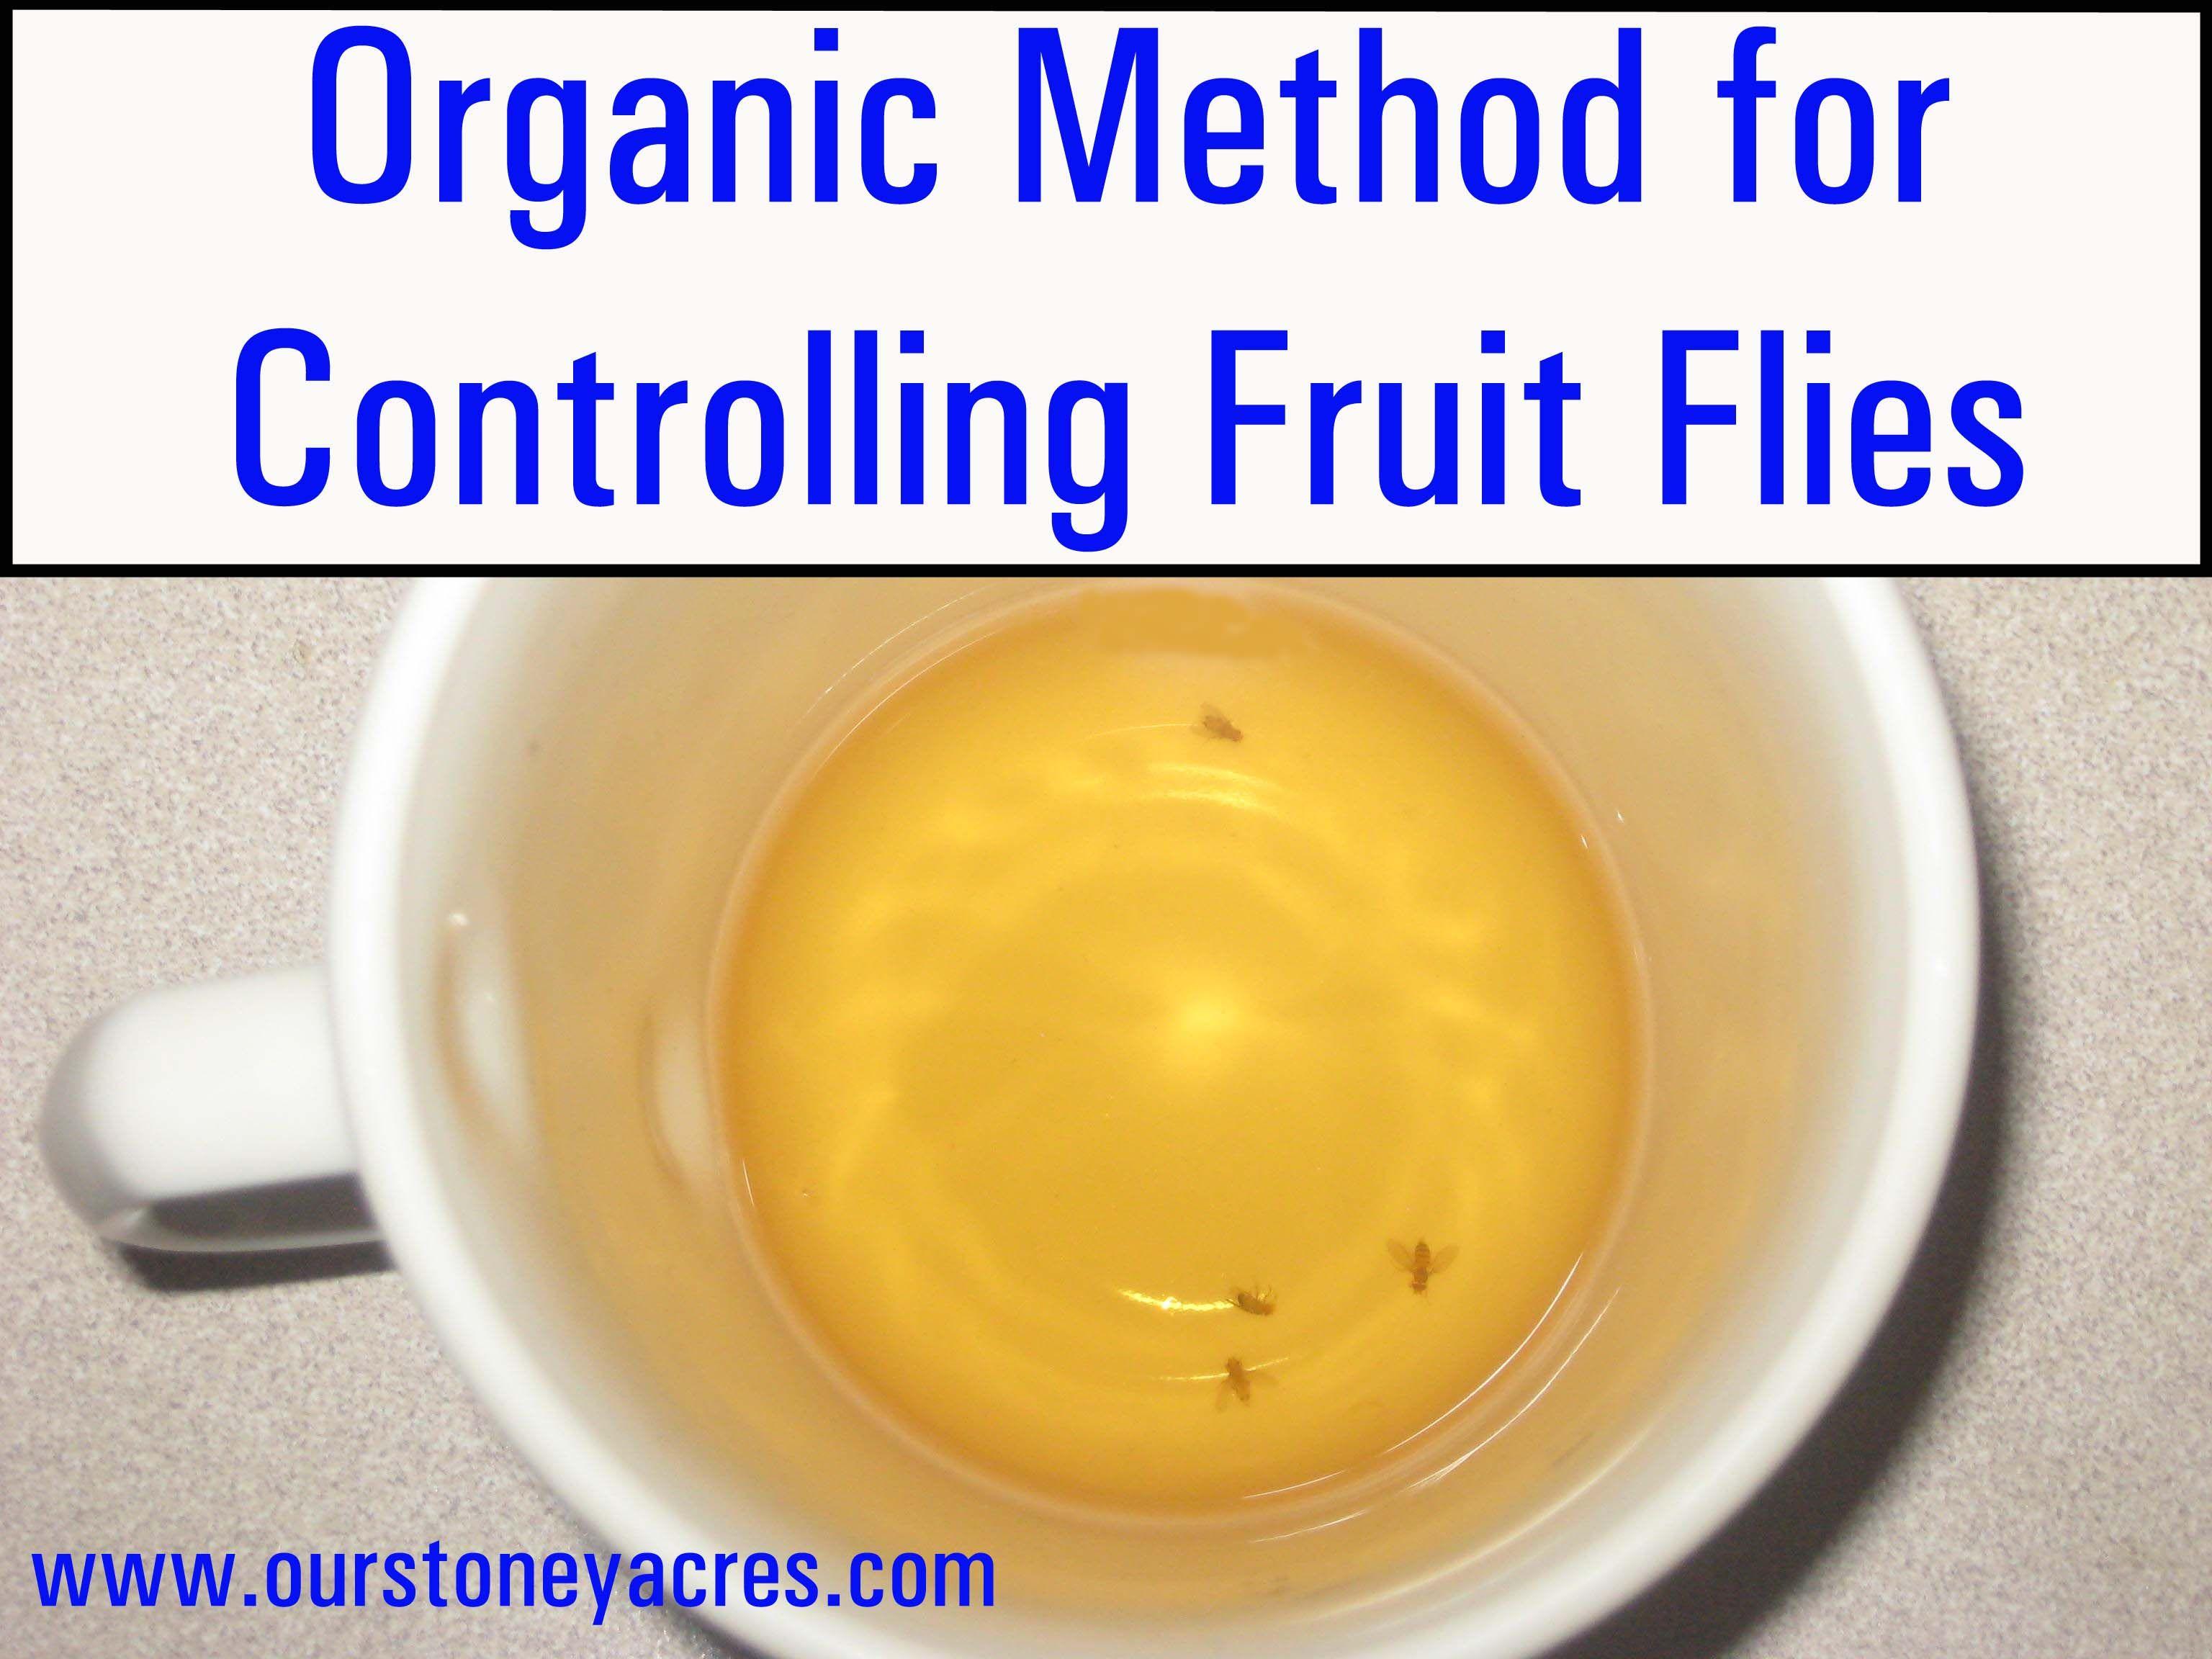 Diy friday organic method for controlling fruit flies organic